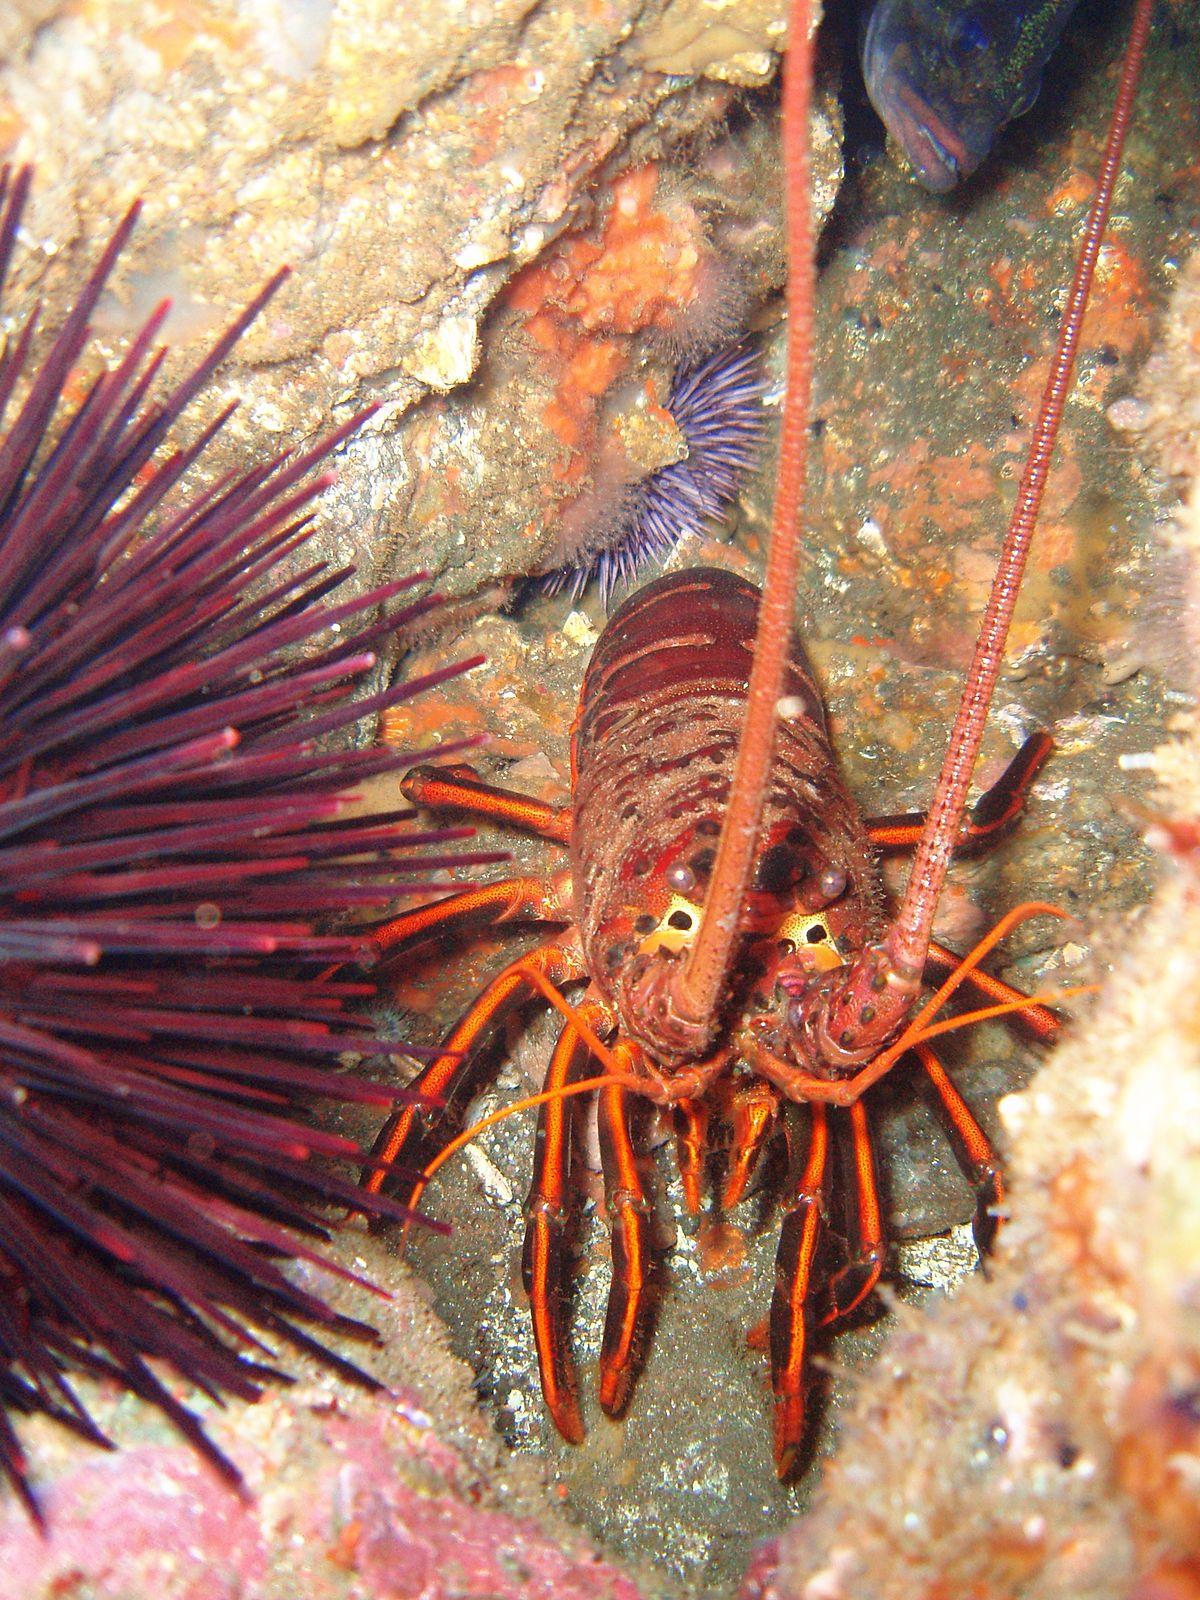 Dana Point State Marine Conservation Area - Wikipedia